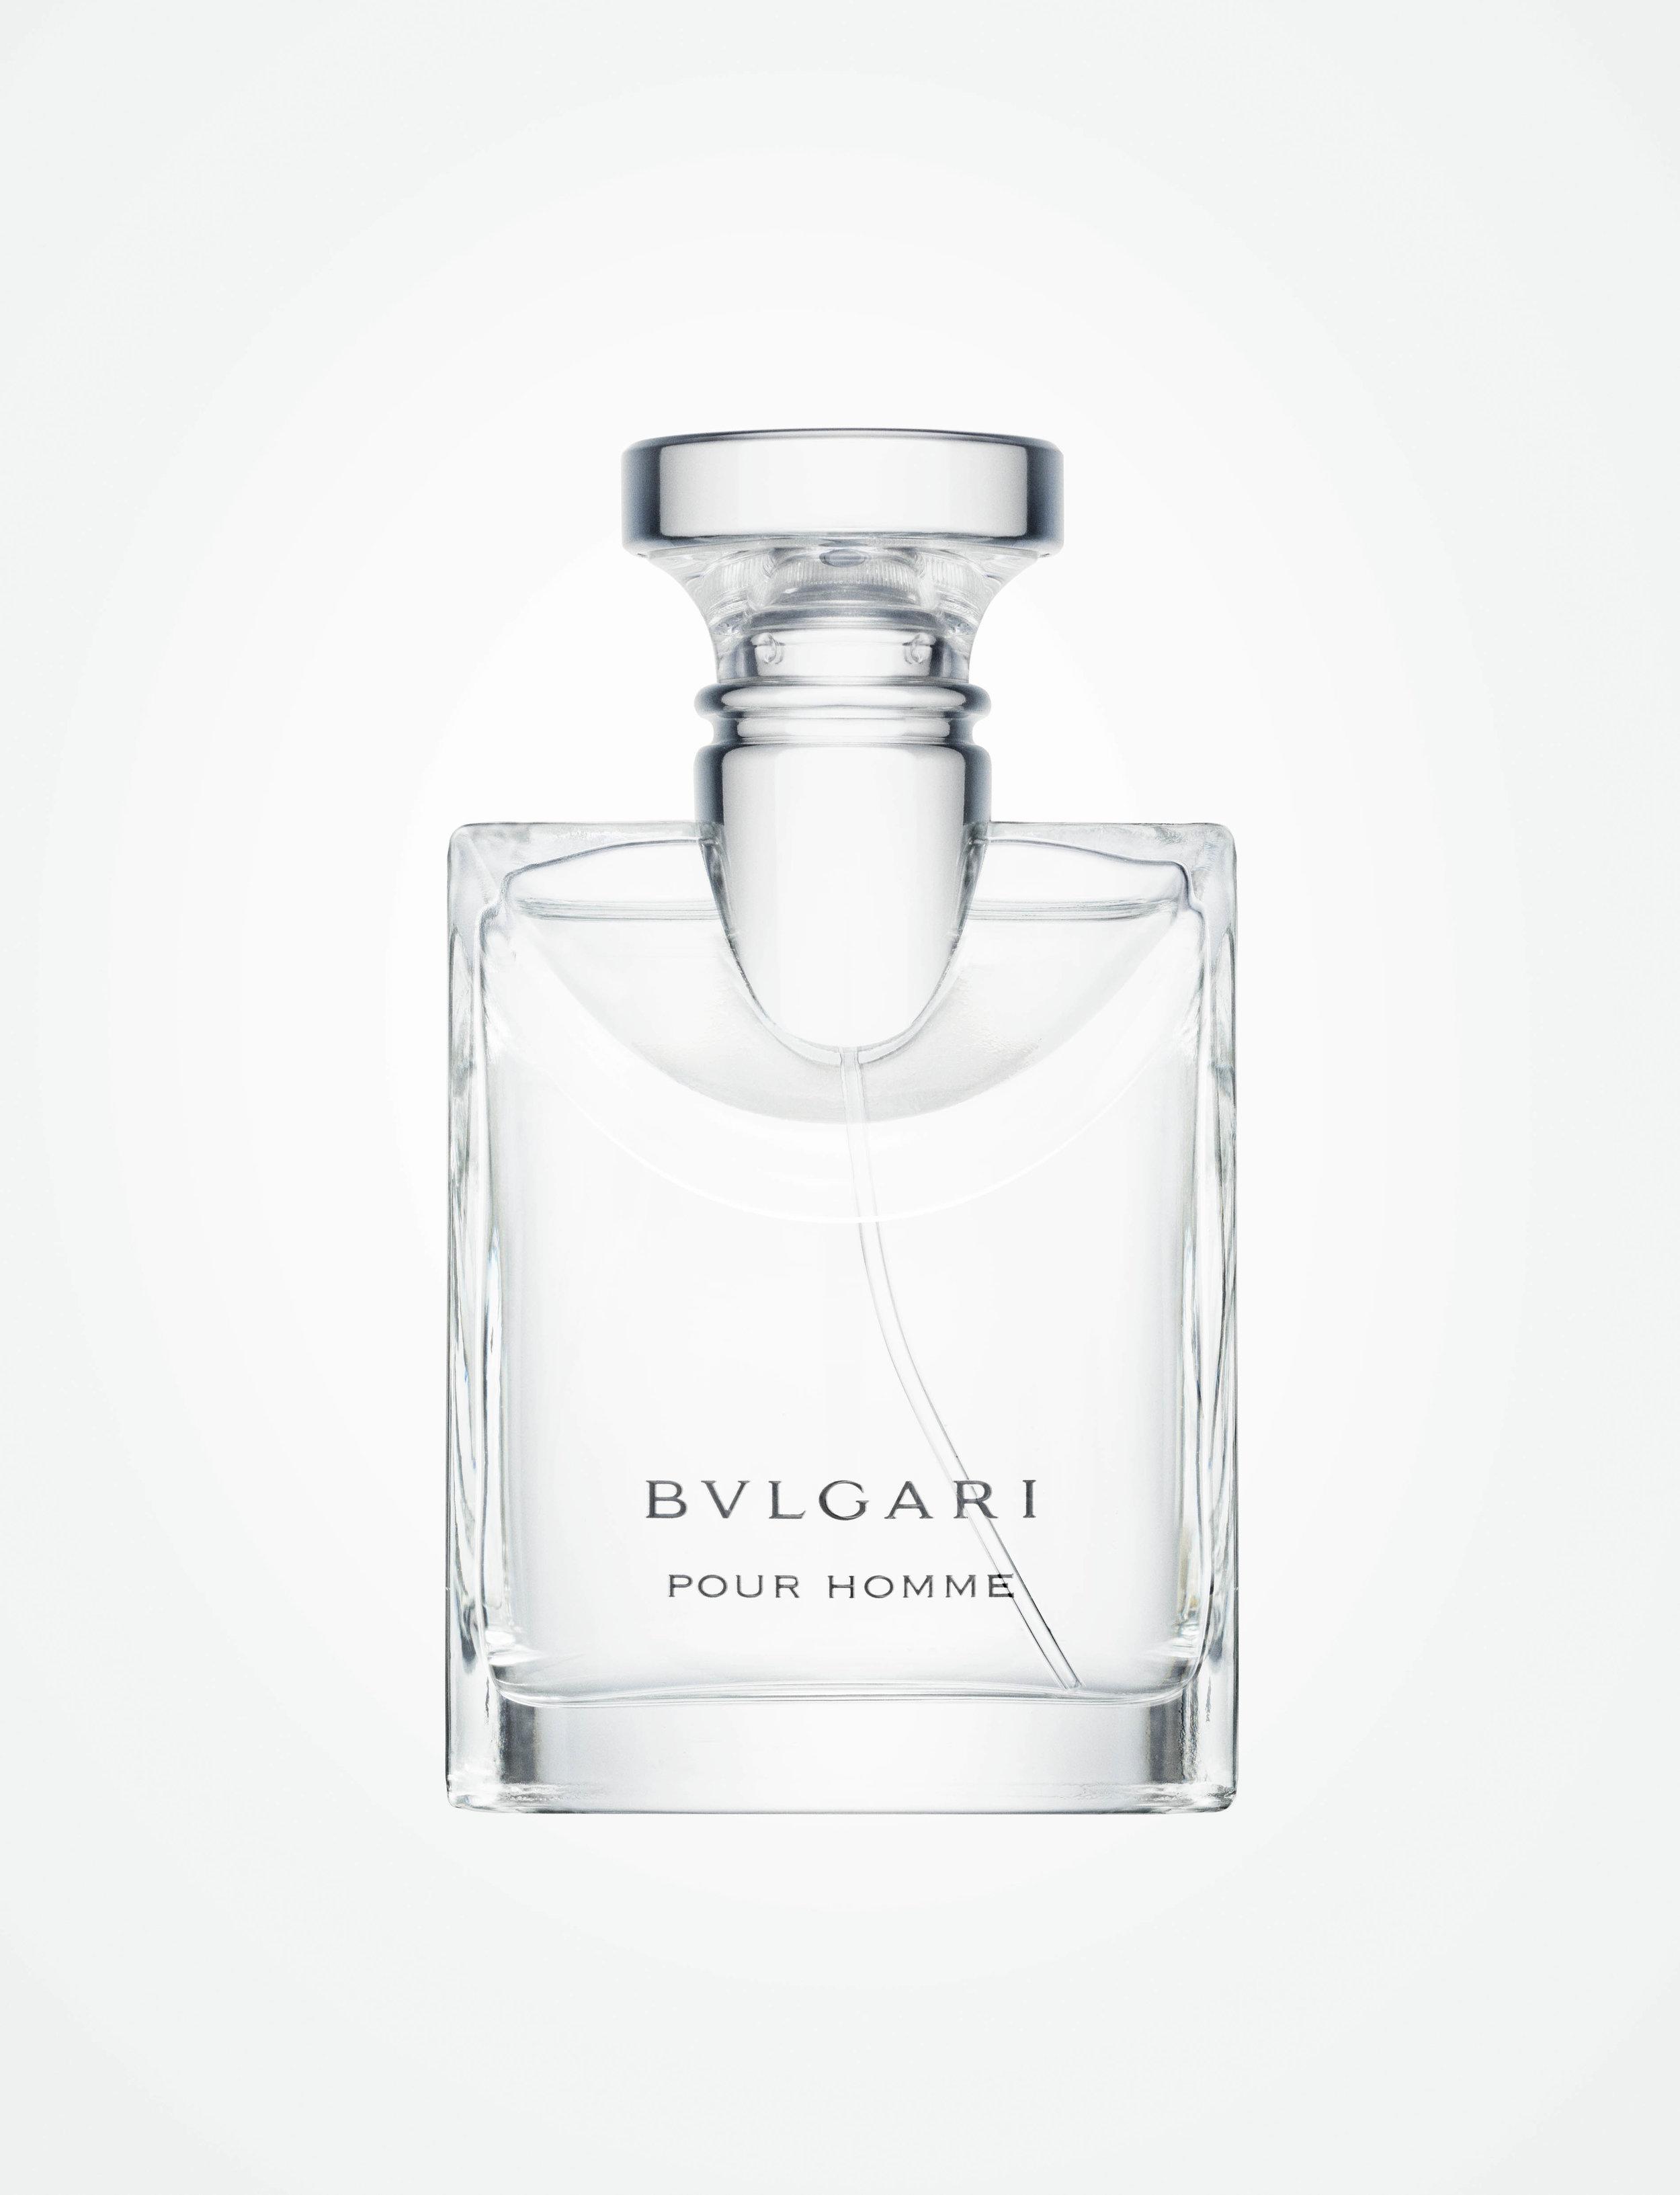 bvlgari_pour_homme_w.jpg